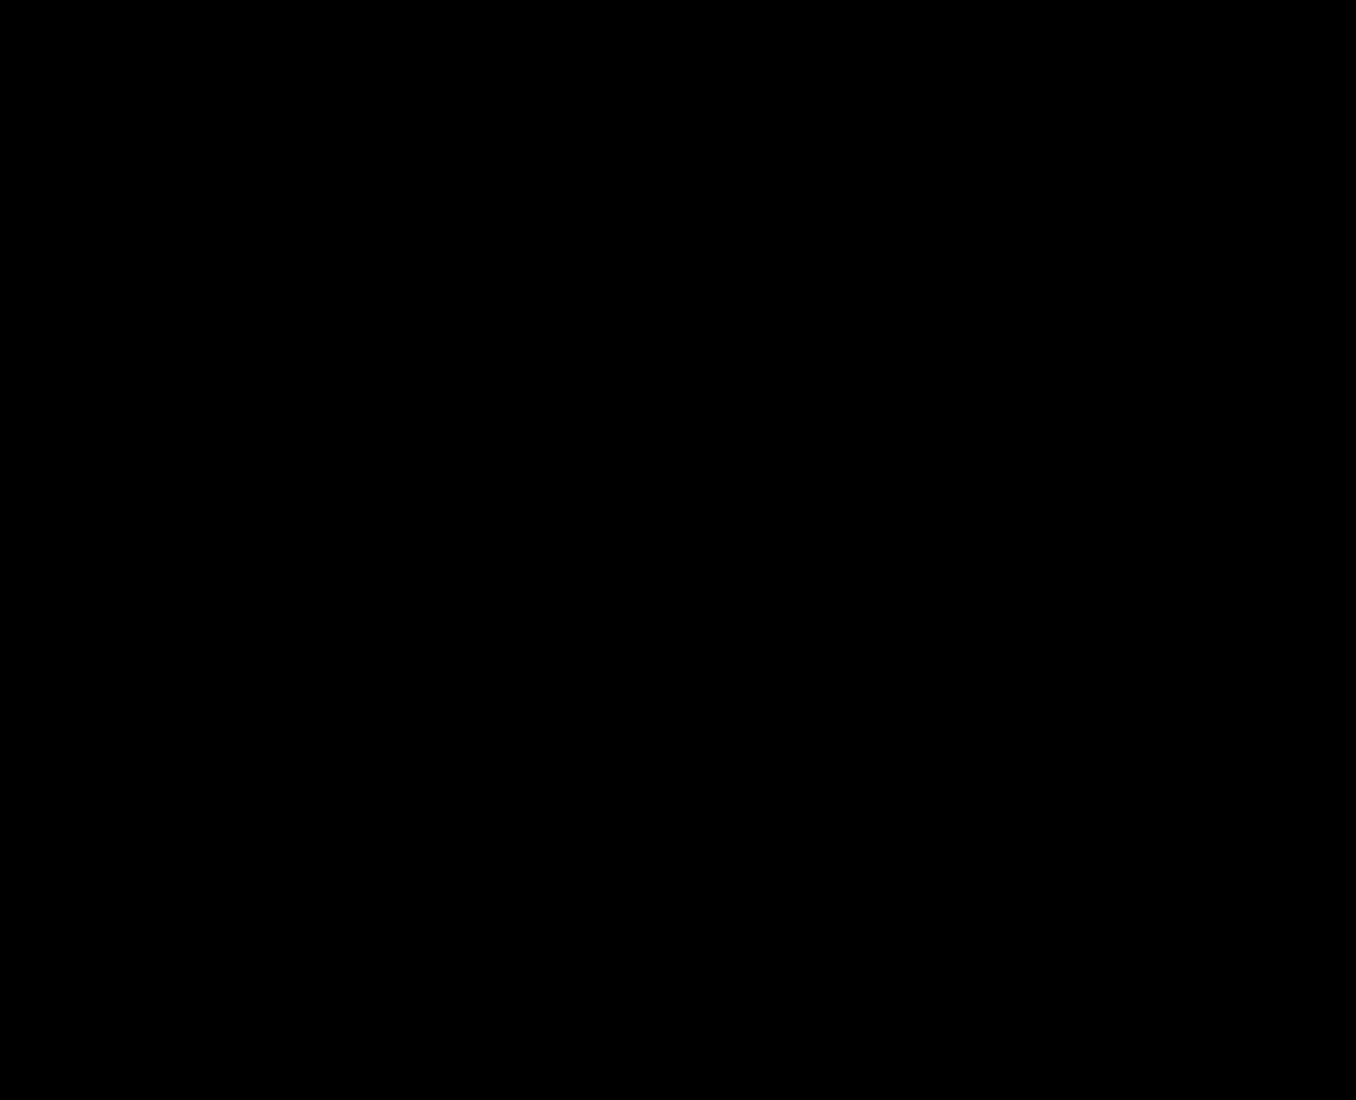 Divano leonardo arredamento genova coloniale for Arredamenti genova